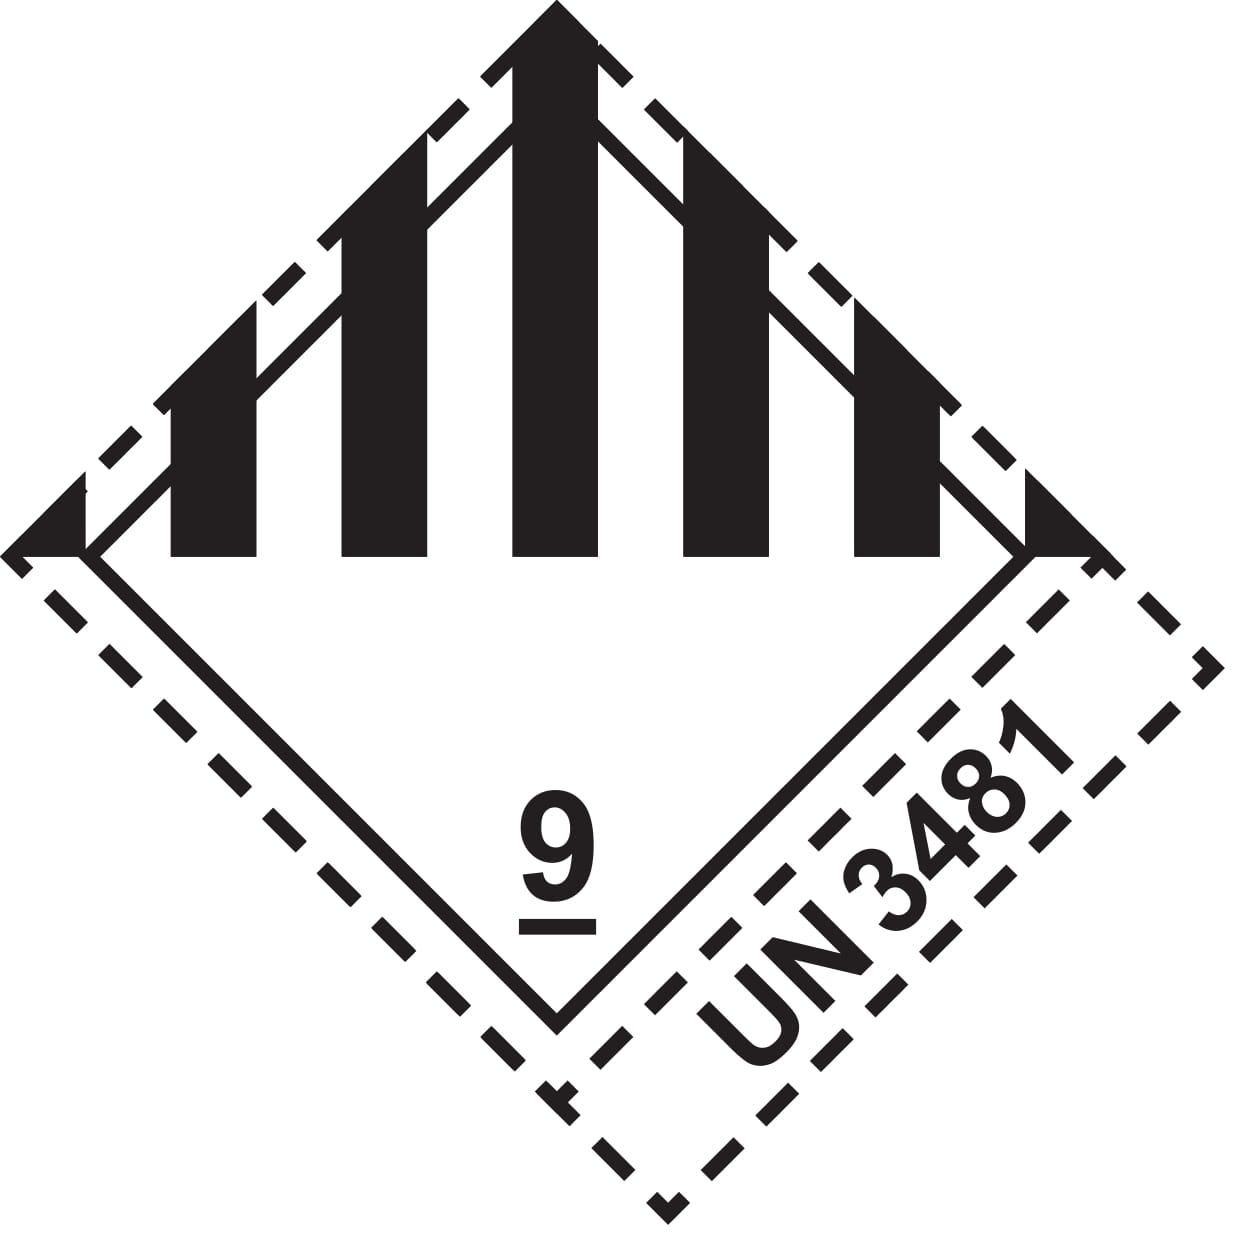 gefahrgut-label-kl9-3481-1